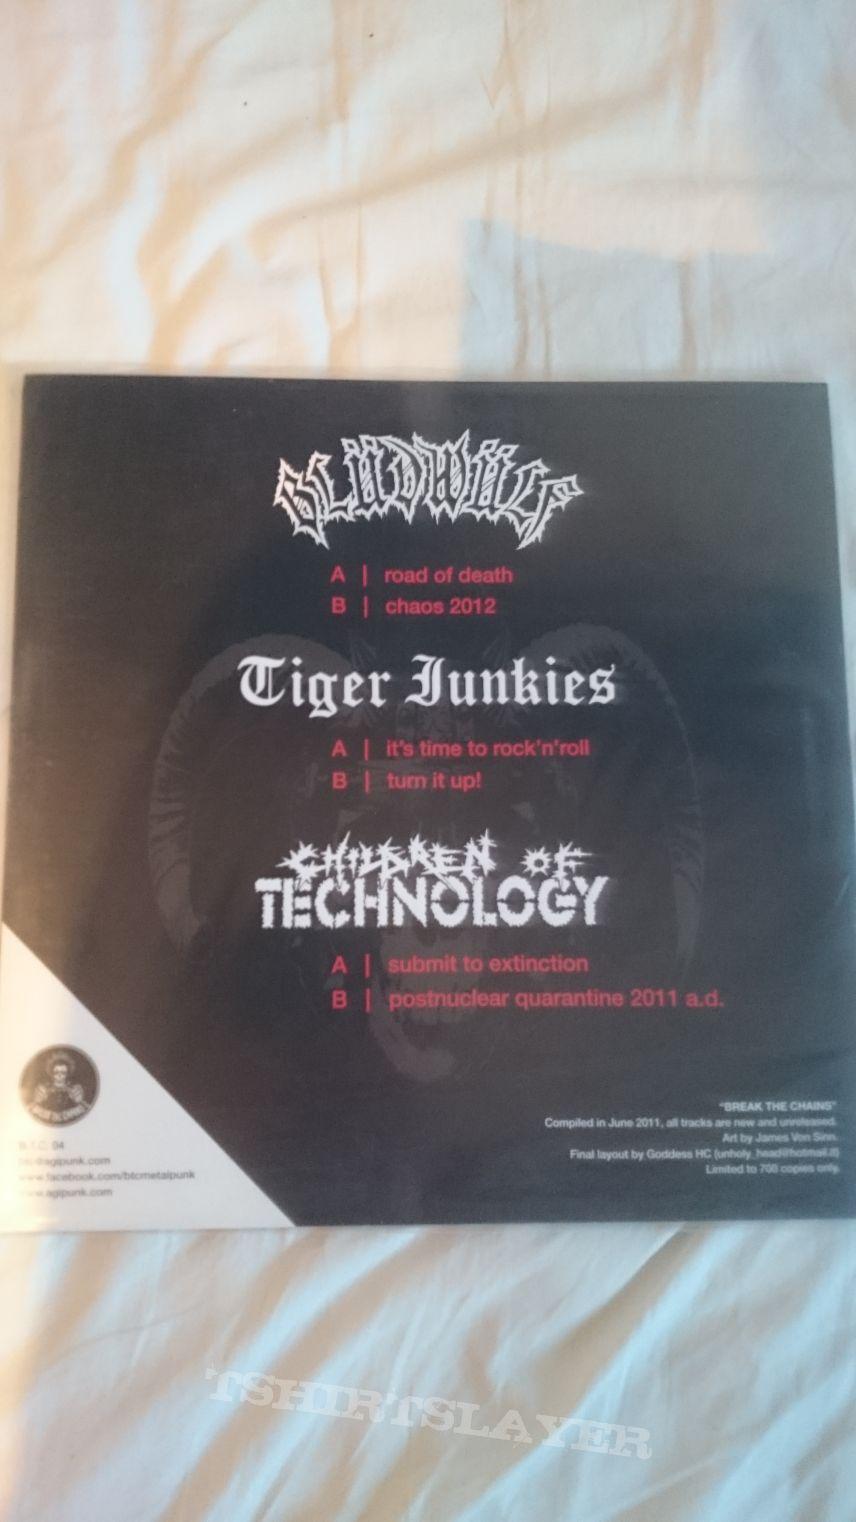 Blüdwülf // Tiger Junkies // Children of Technology split